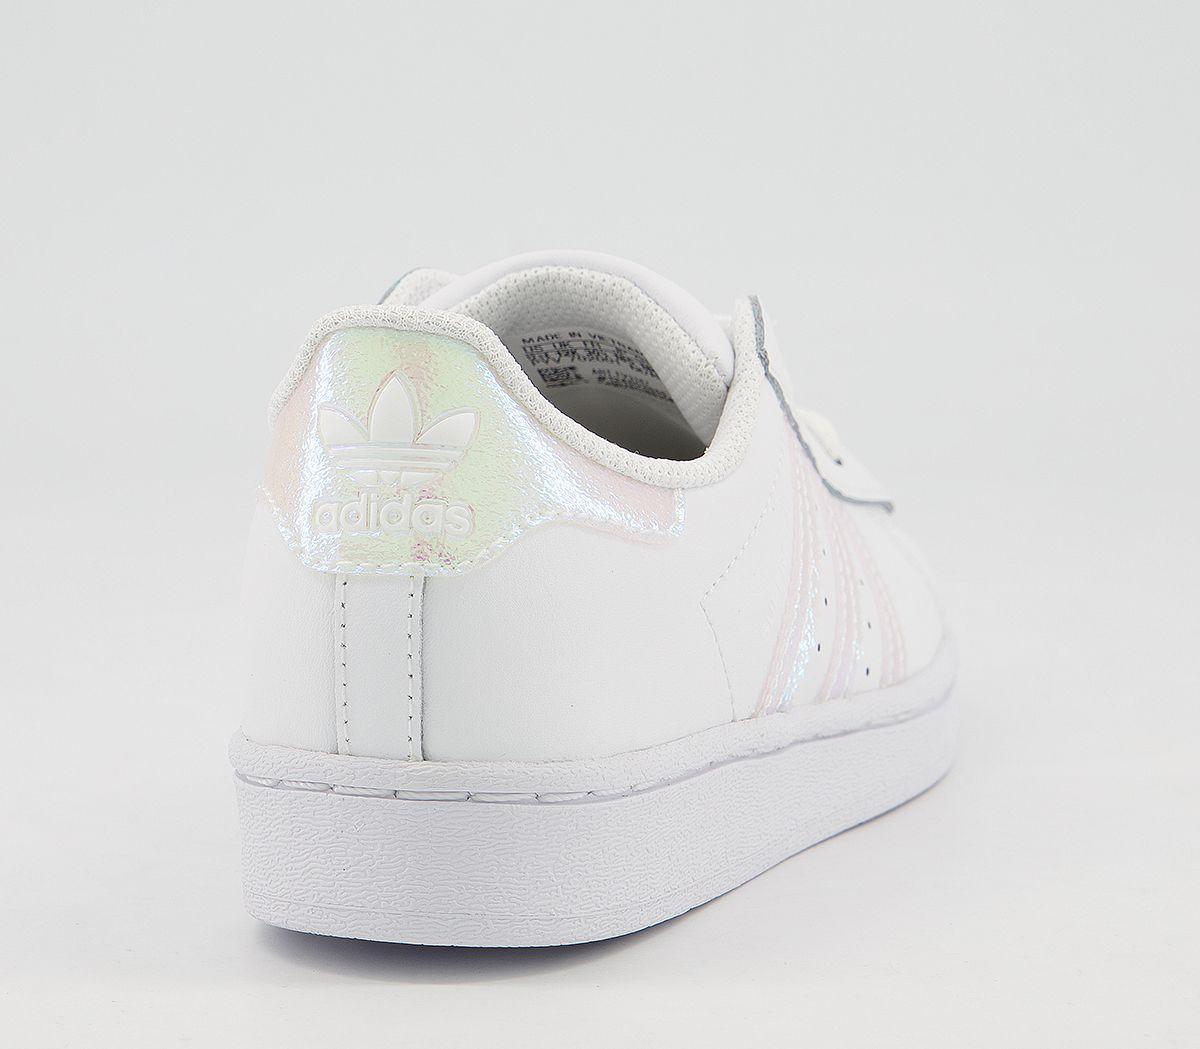 Dettagli su Bambini Adidas Superstar Bambini 10 2 Scarpe Sportive Bianco Iridescente Bambini